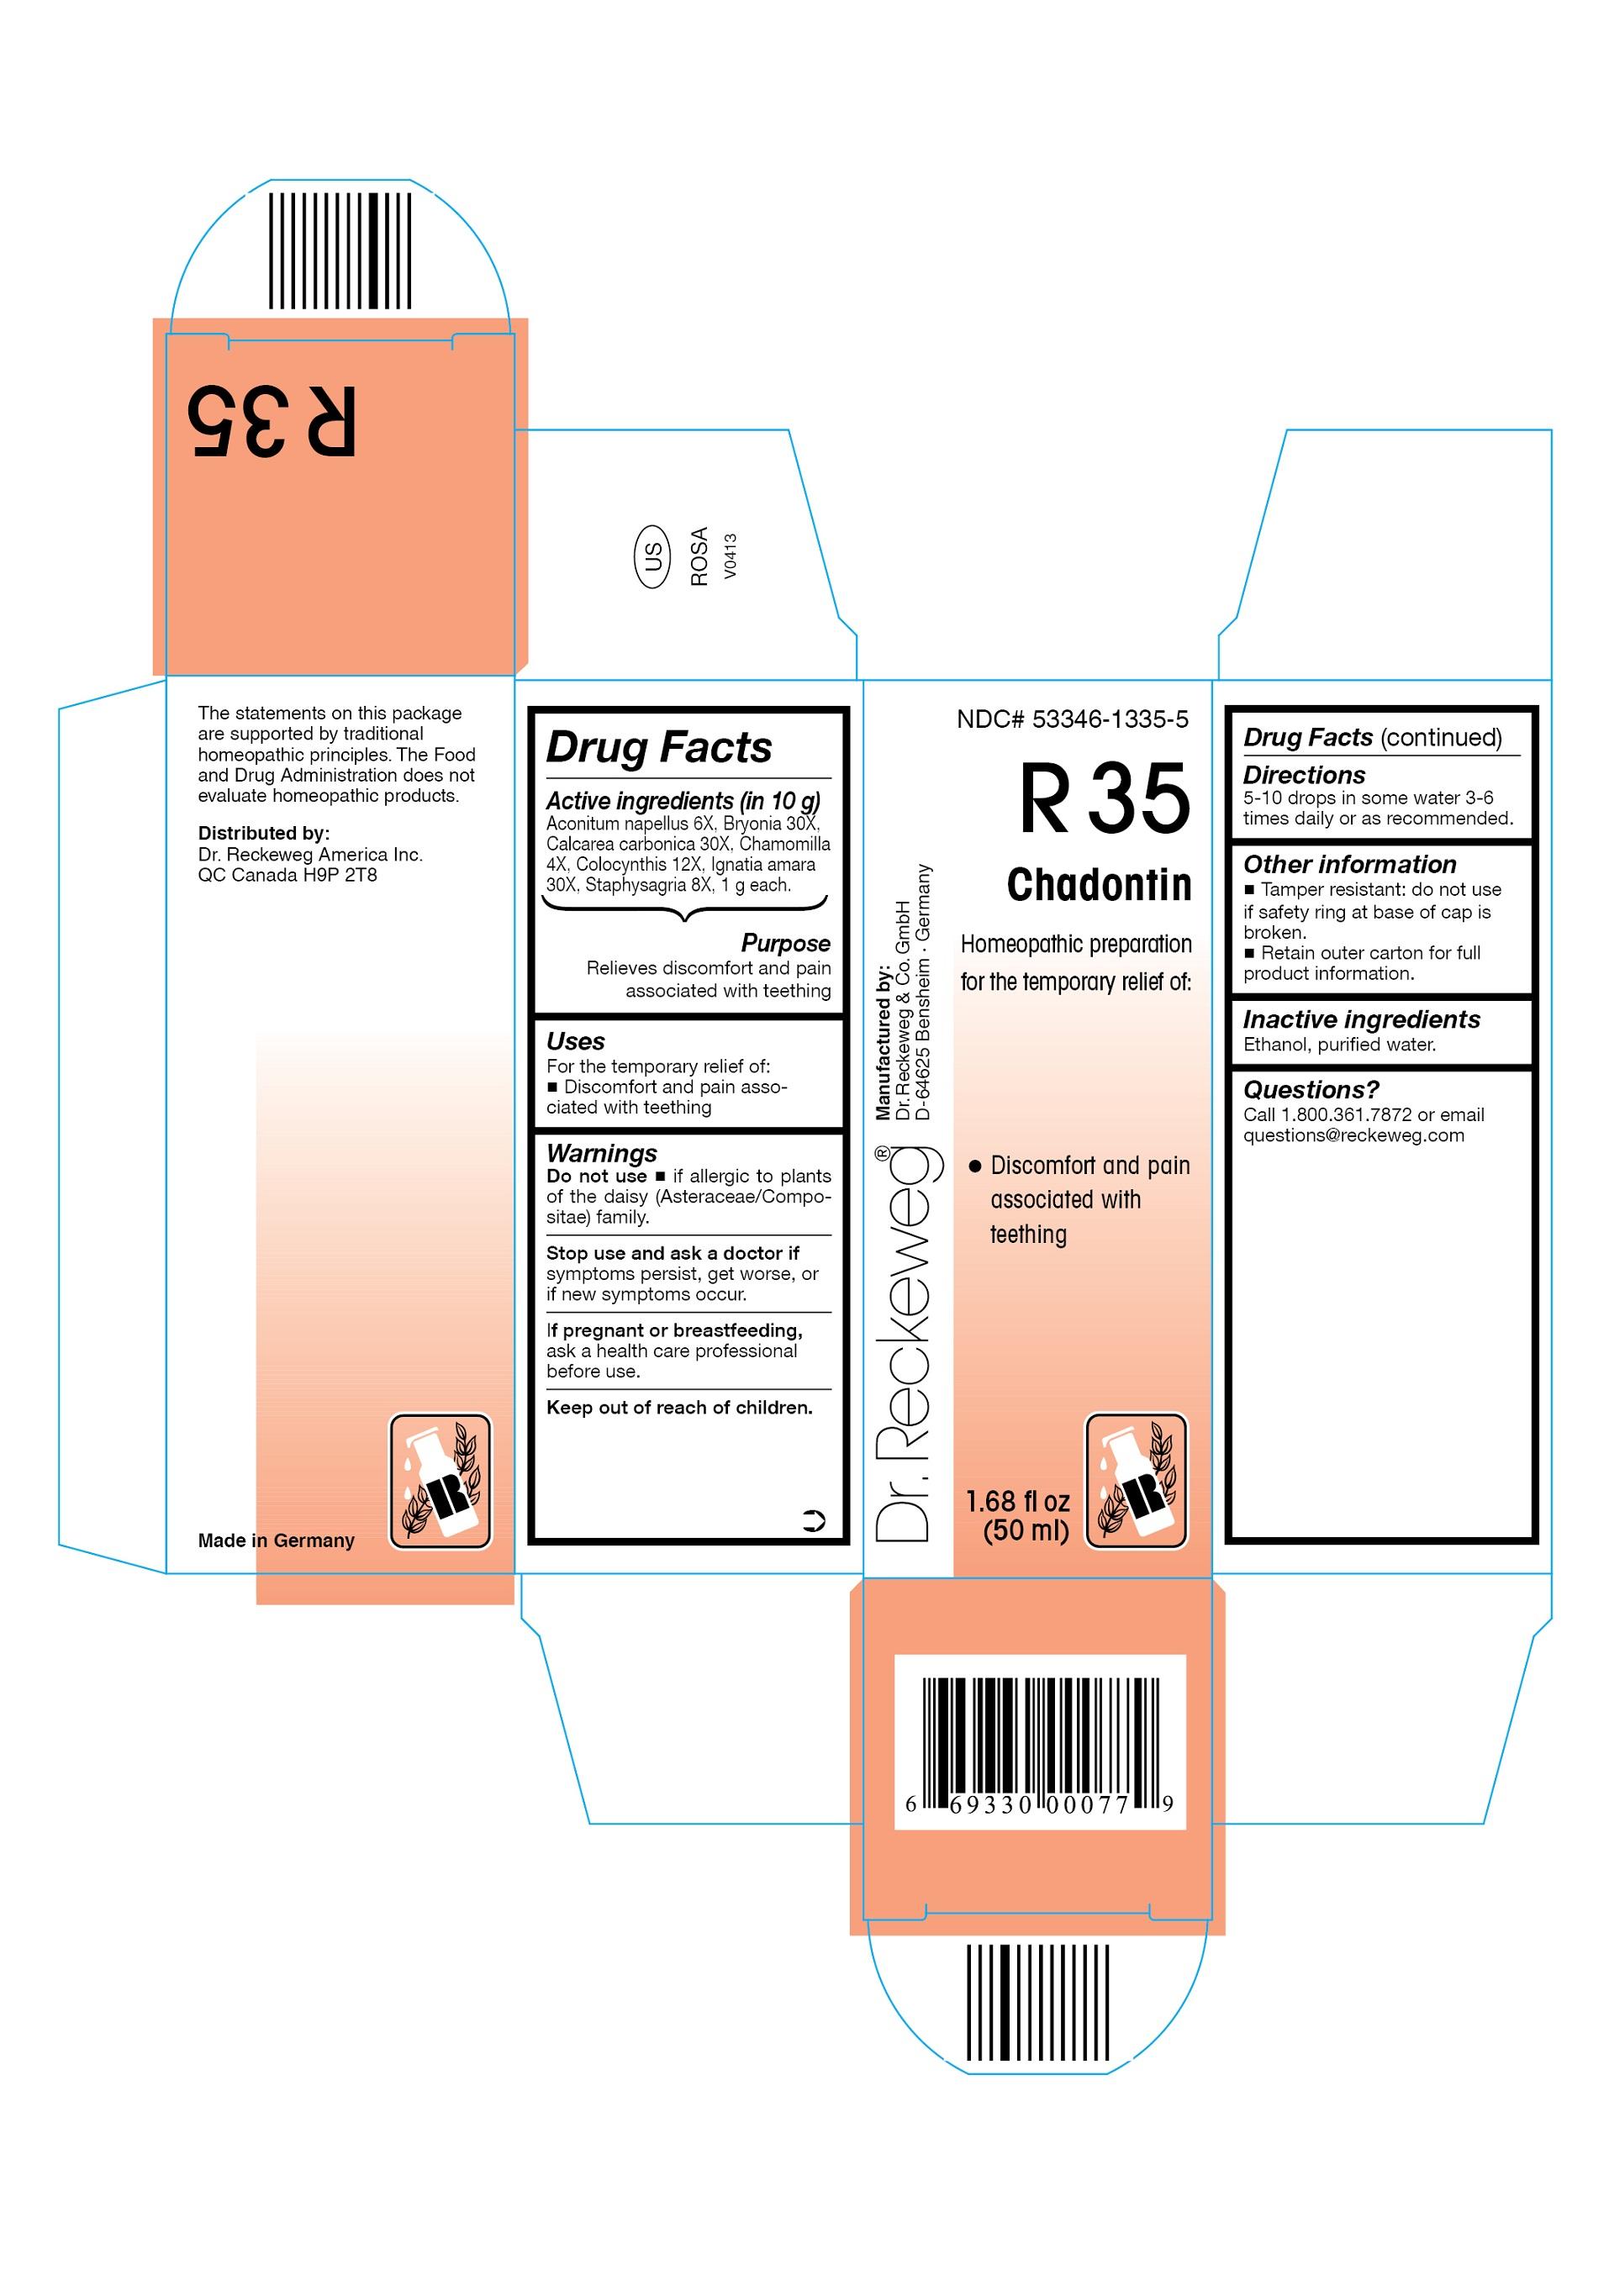 Dr. Reckeweg R35 Chadontin Combination Product (Aconitum Napellus 6x, Bryonia 30x, Calcarea Carbonica 30x, Chamomilla 4x, Colocynthis 12x, Ignatia Amara 30x, Staphysagria 8x) Liquid [Pharmazeutische Fabrik Dr. Reckeweg & Co]